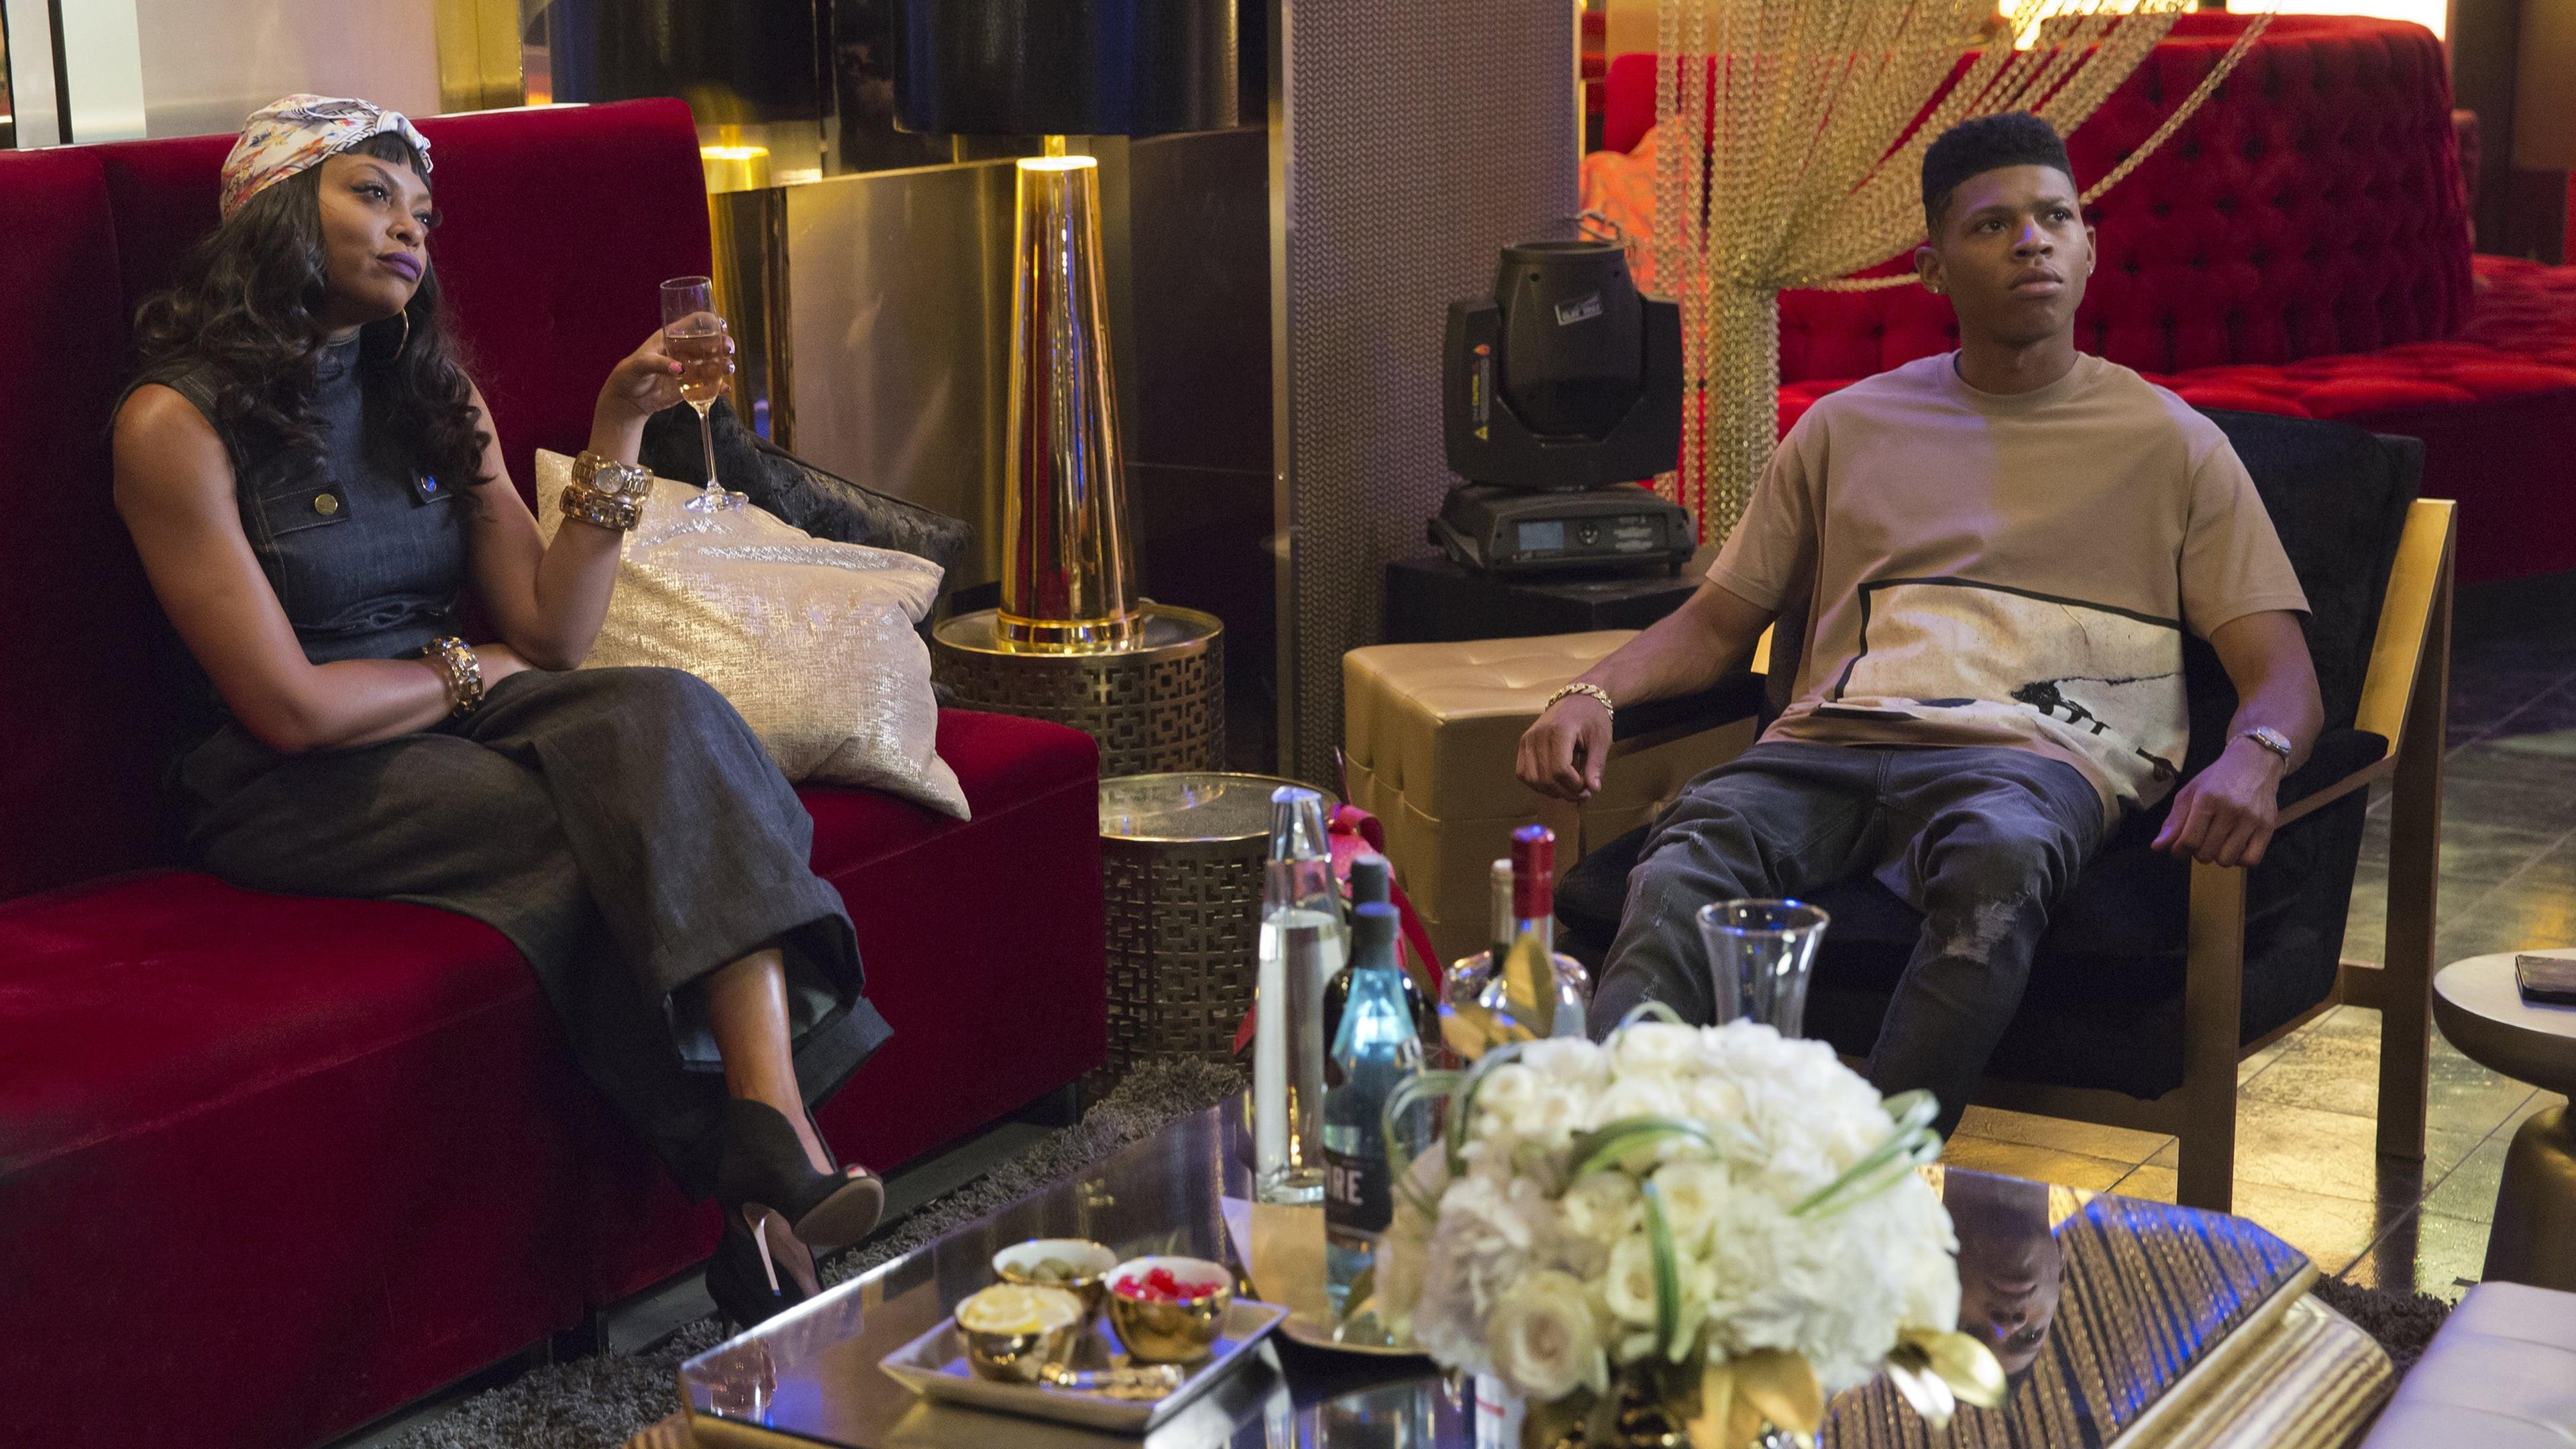 empire season 2 episode 4 openload watch online full episode free tv show. Black Bedroom Furniture Sets. Home Design Ideas